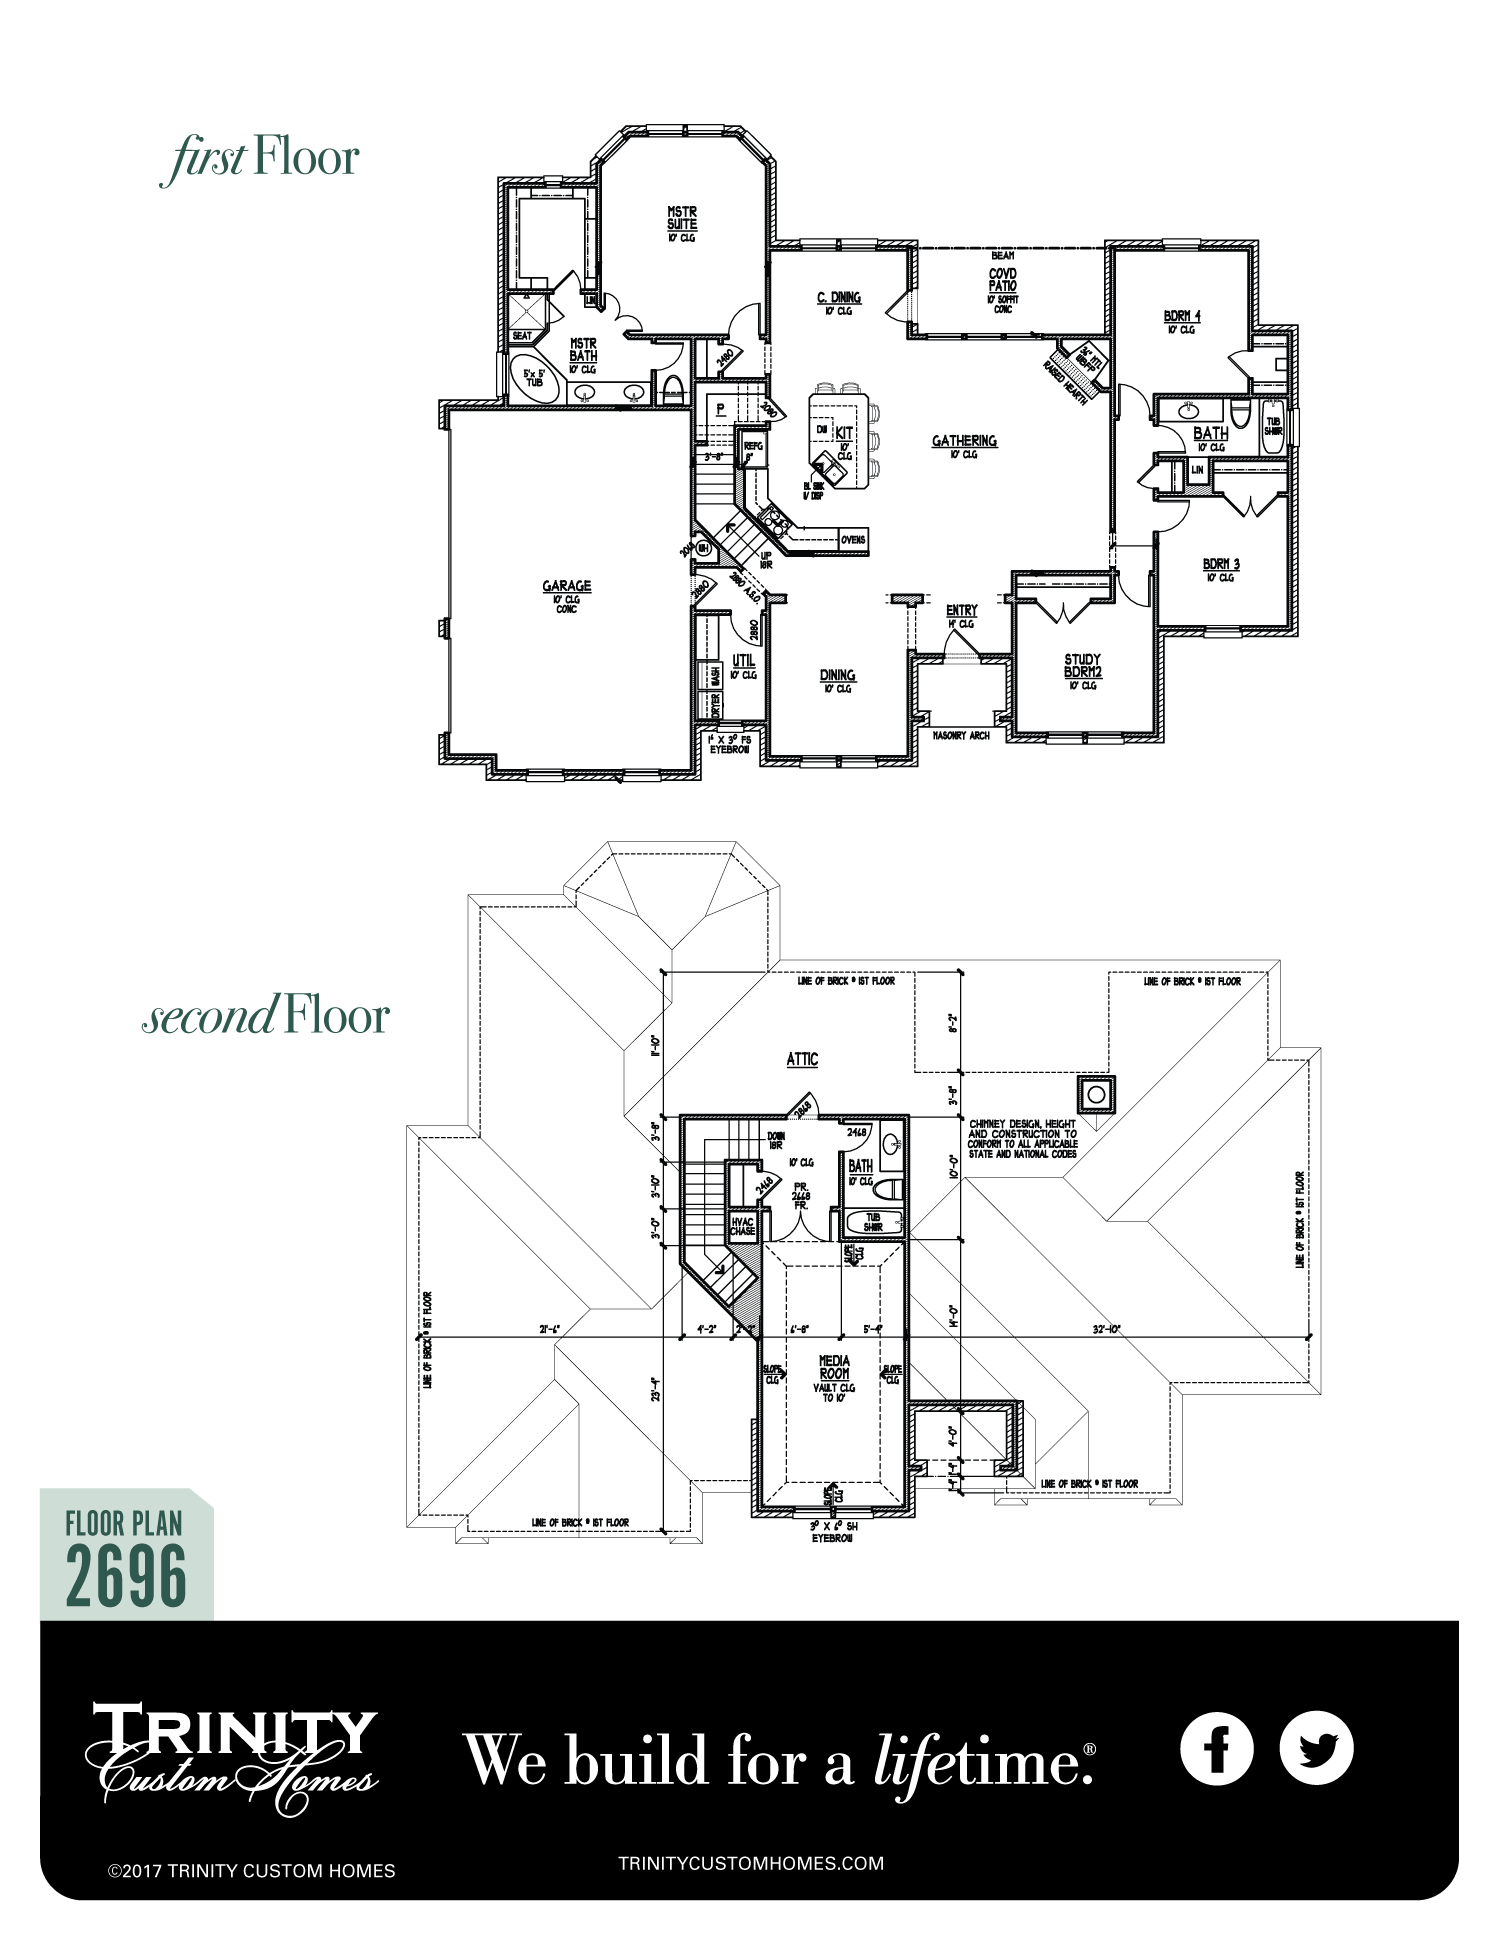 FloorPlan2696